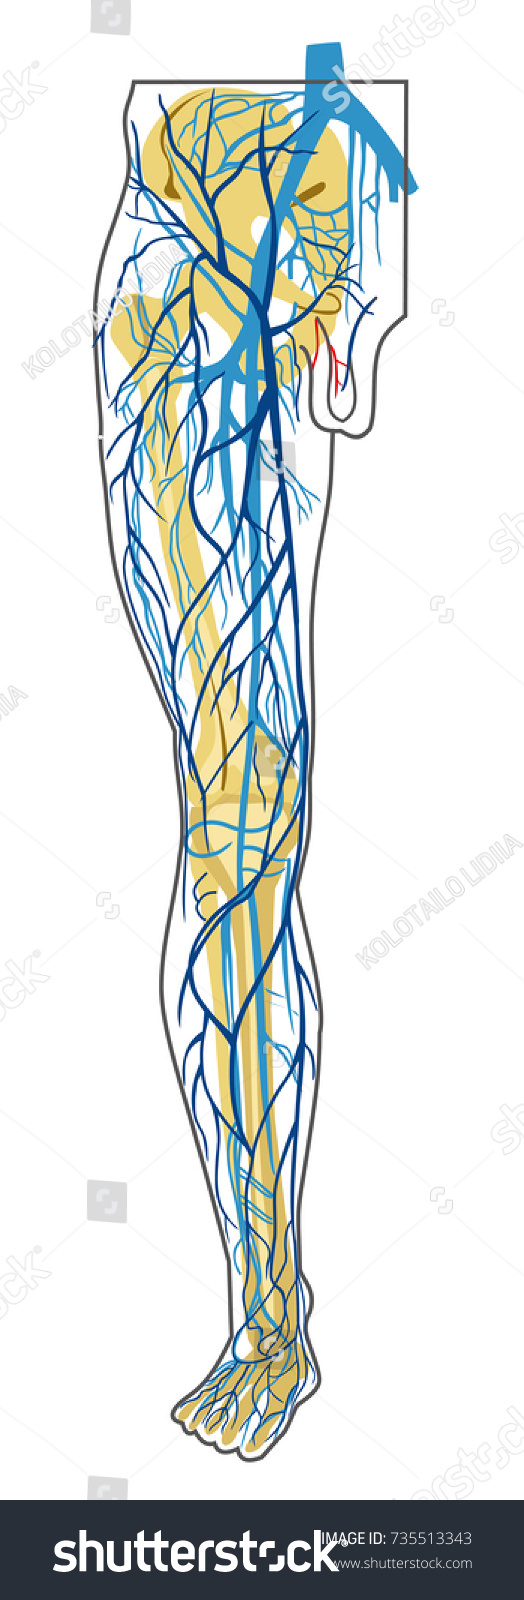 Human Anatomy Deep Superficial Leg Veins Stock Vector Royalty Free